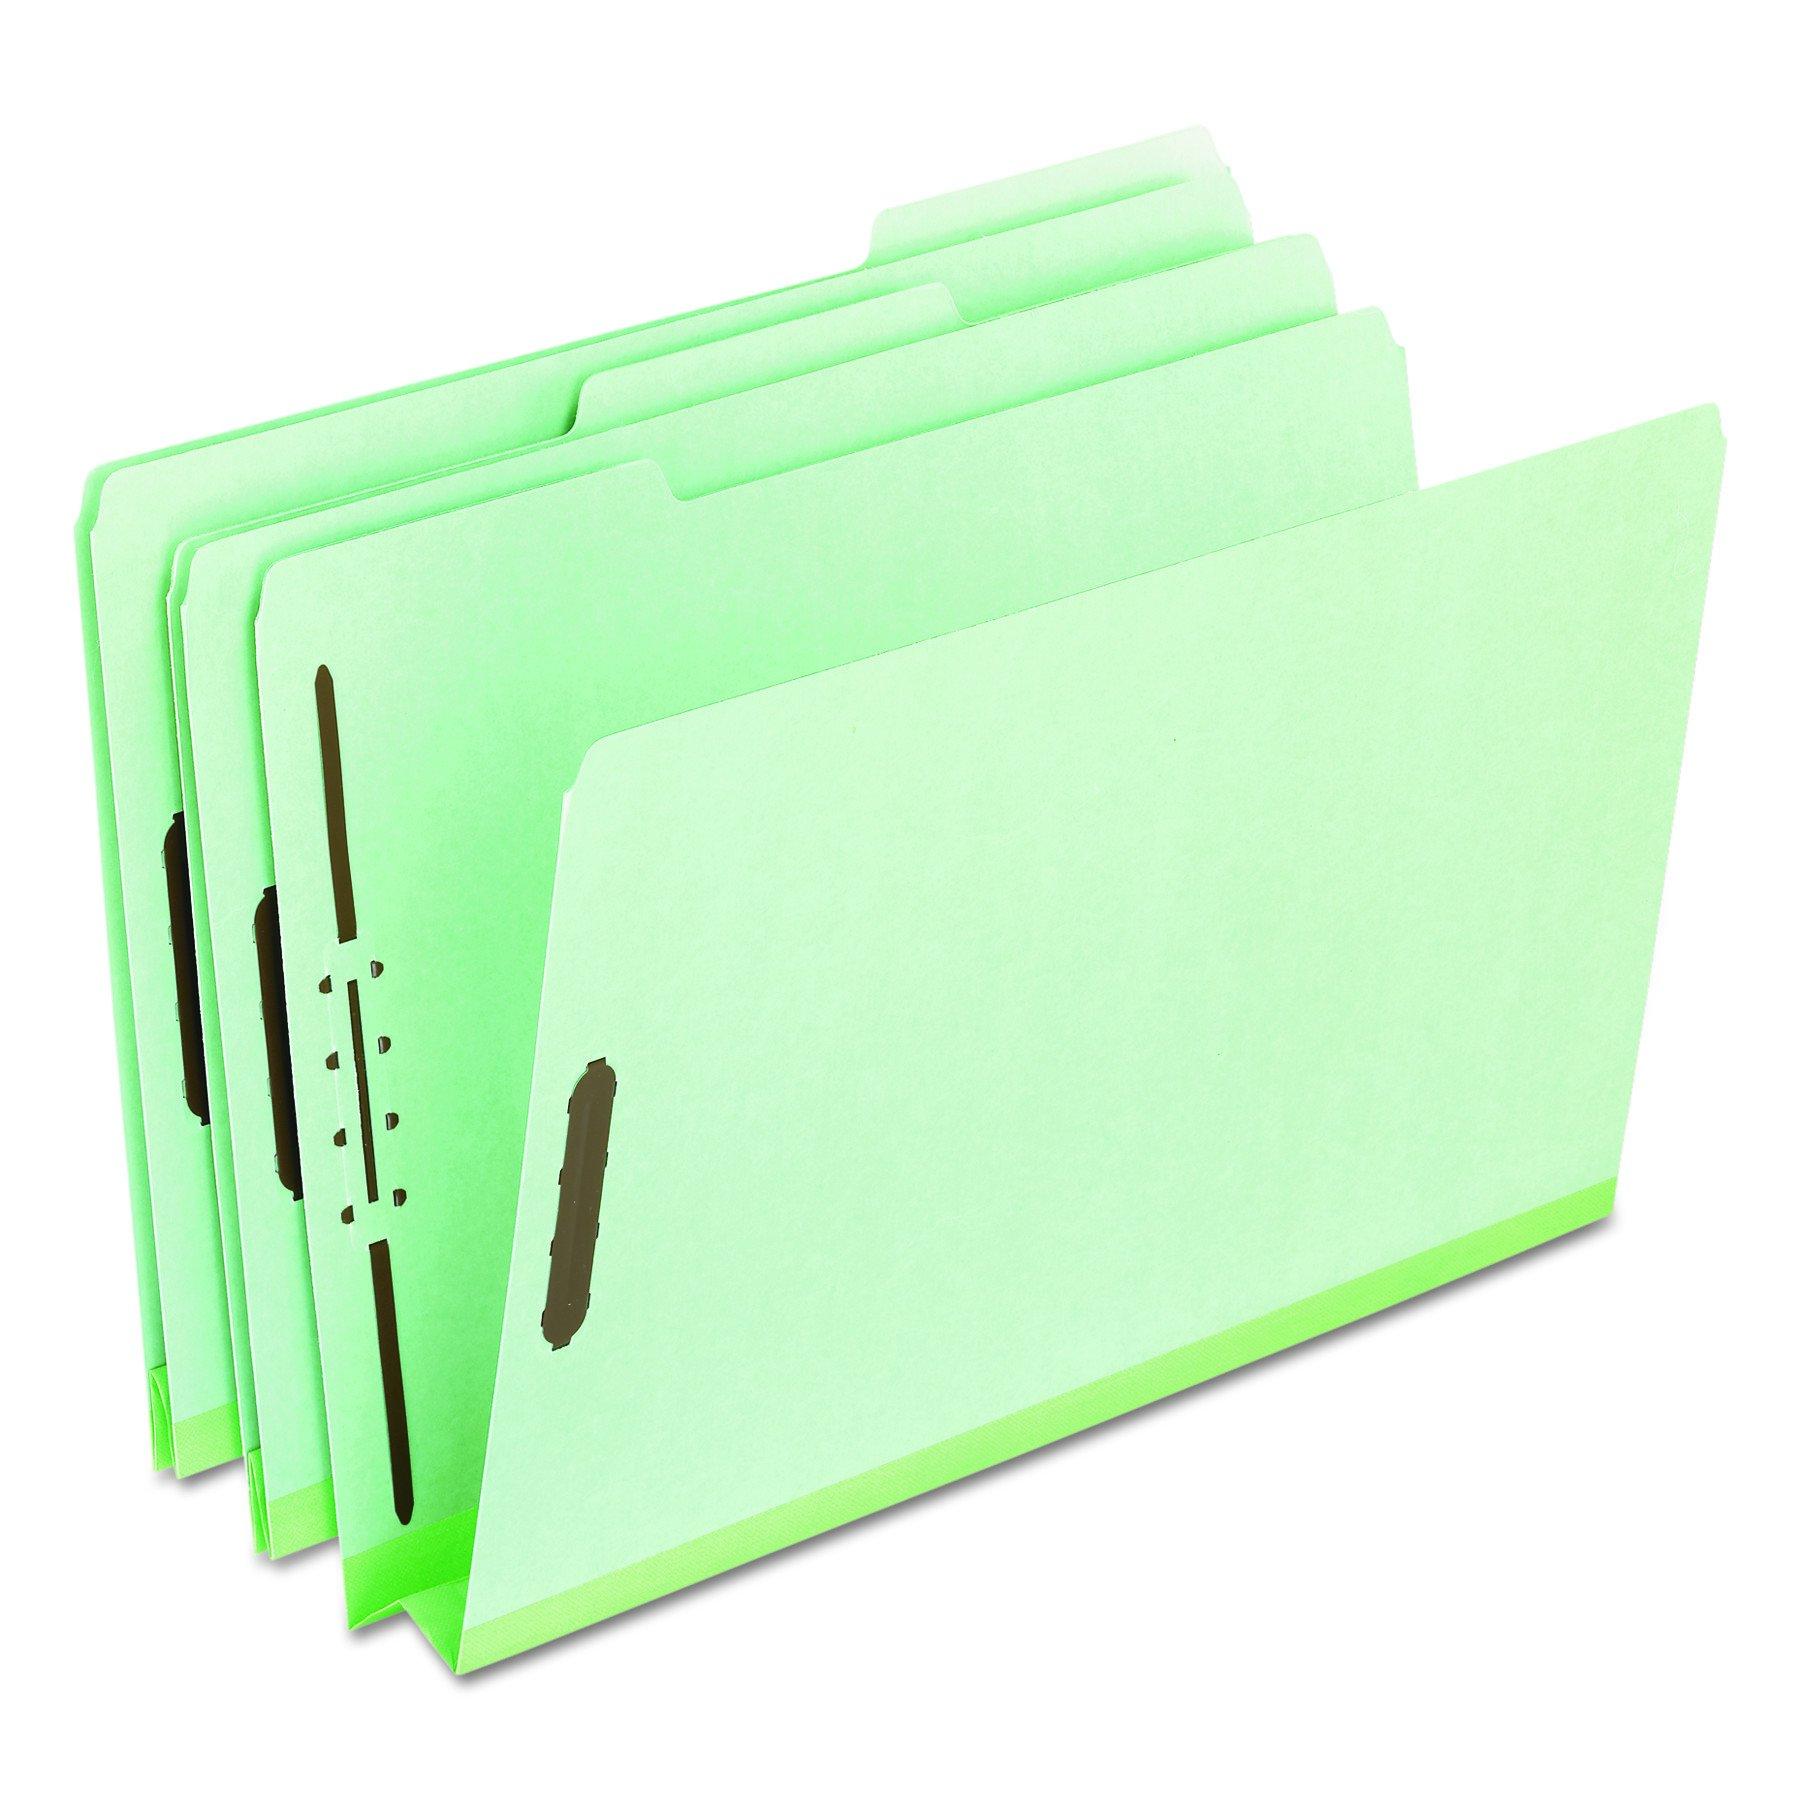 Pendaflex 17186 Pressboard Folders, 2 Fasteners, 2'' Expansion, 1/3 Tab, Legal, Green (Box of 25)